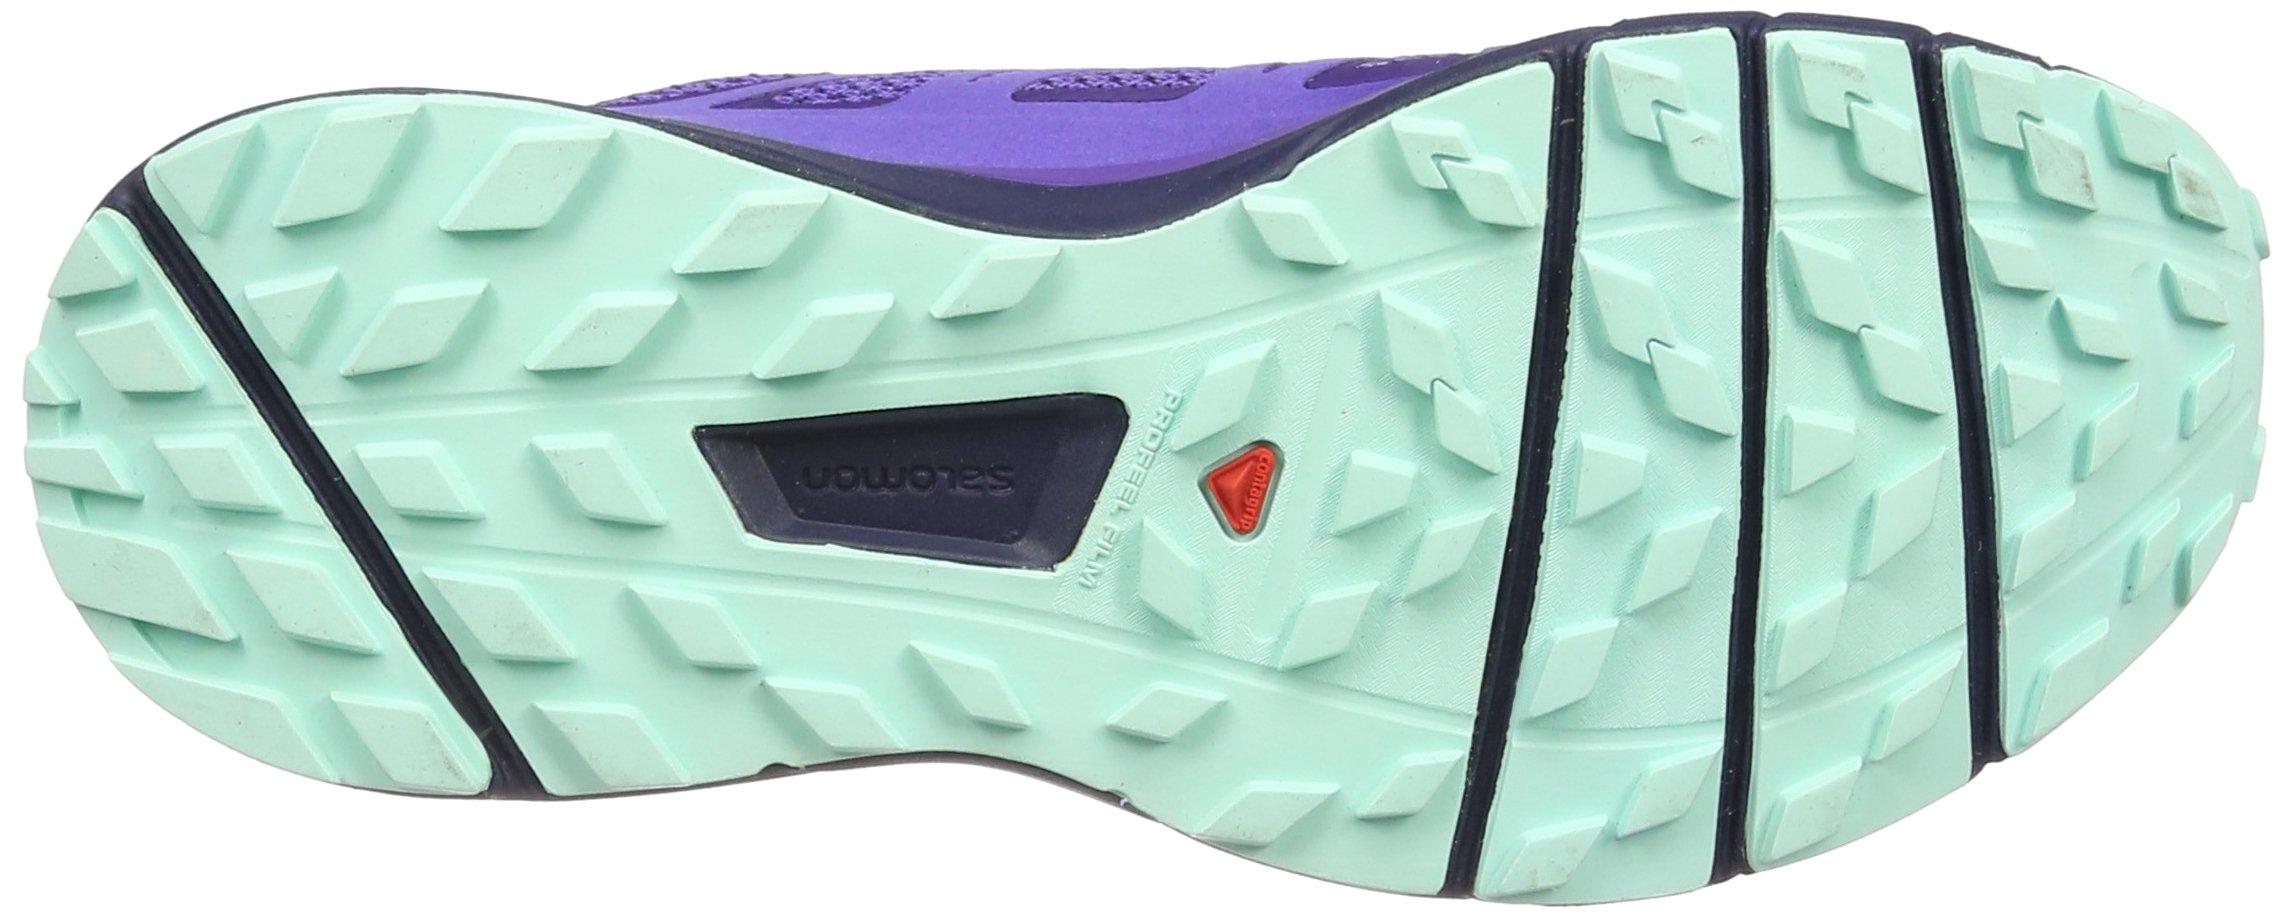 Salomon Women's Sense Ride Running Shoes, Purple, 6.5 M by Salomon (Image #3)